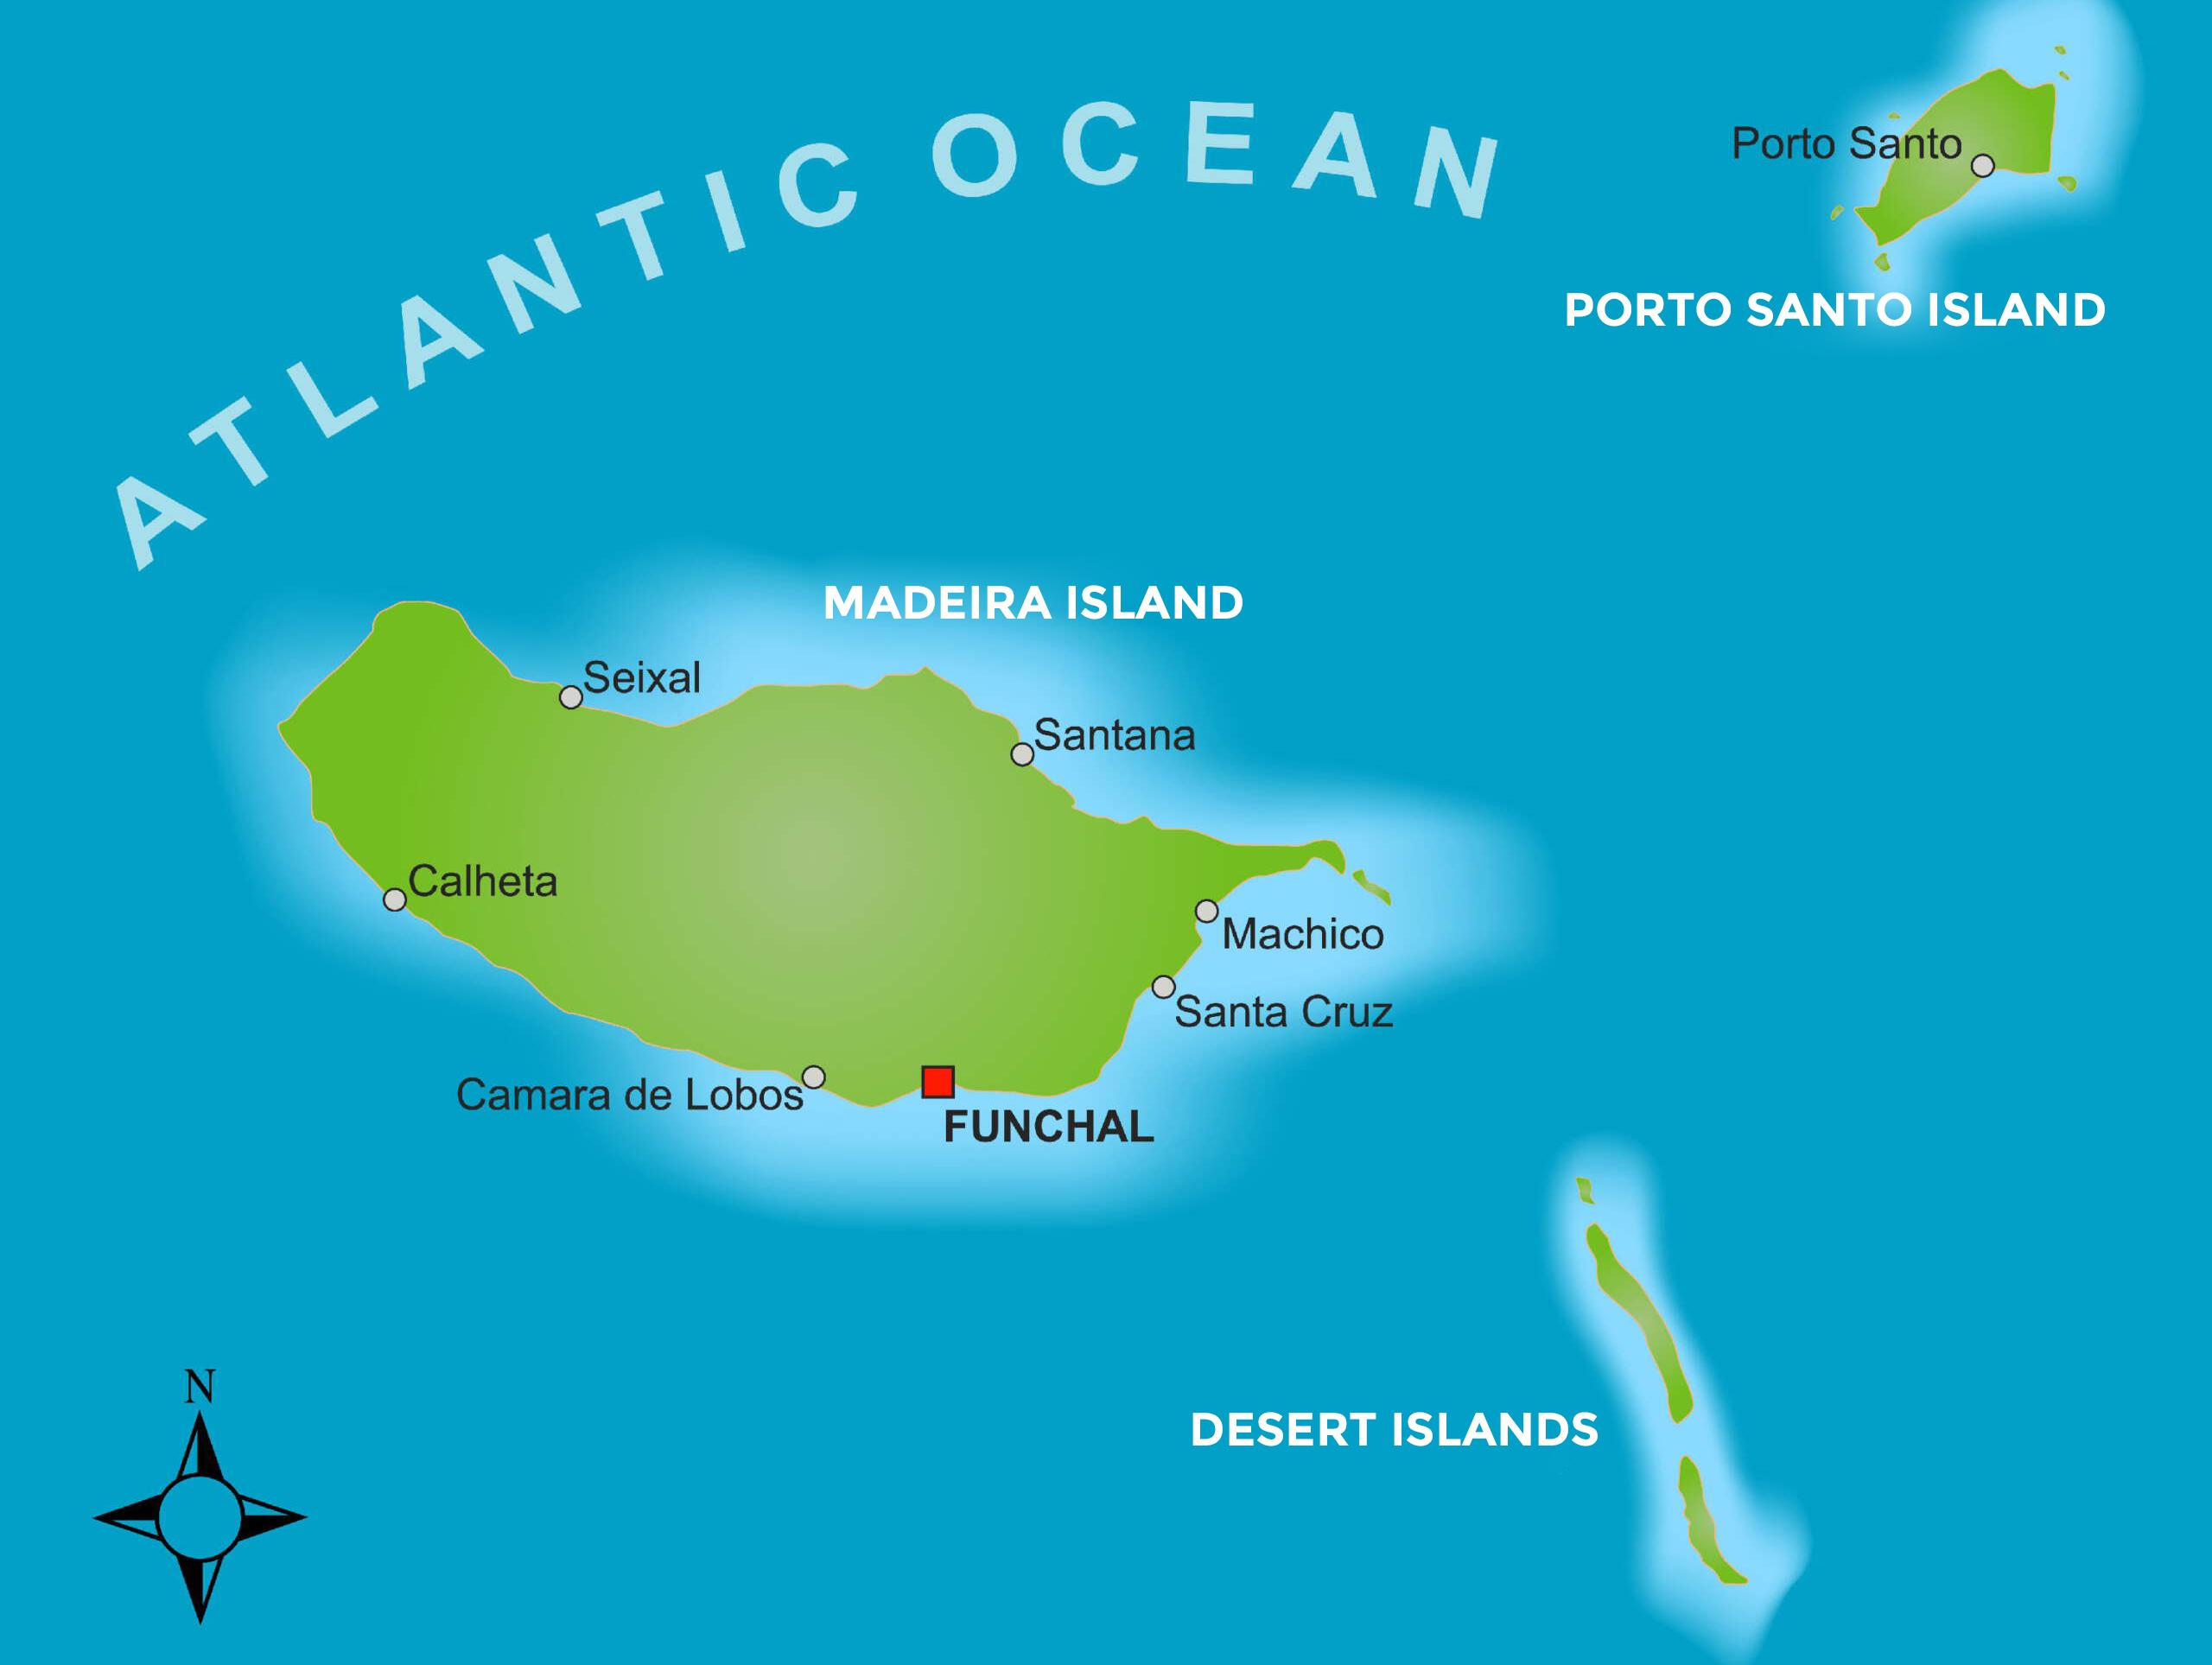 https://www.atlantivacations.com/wp-content/uploads/2021/01/madeira_map_atlantivacations.jpg